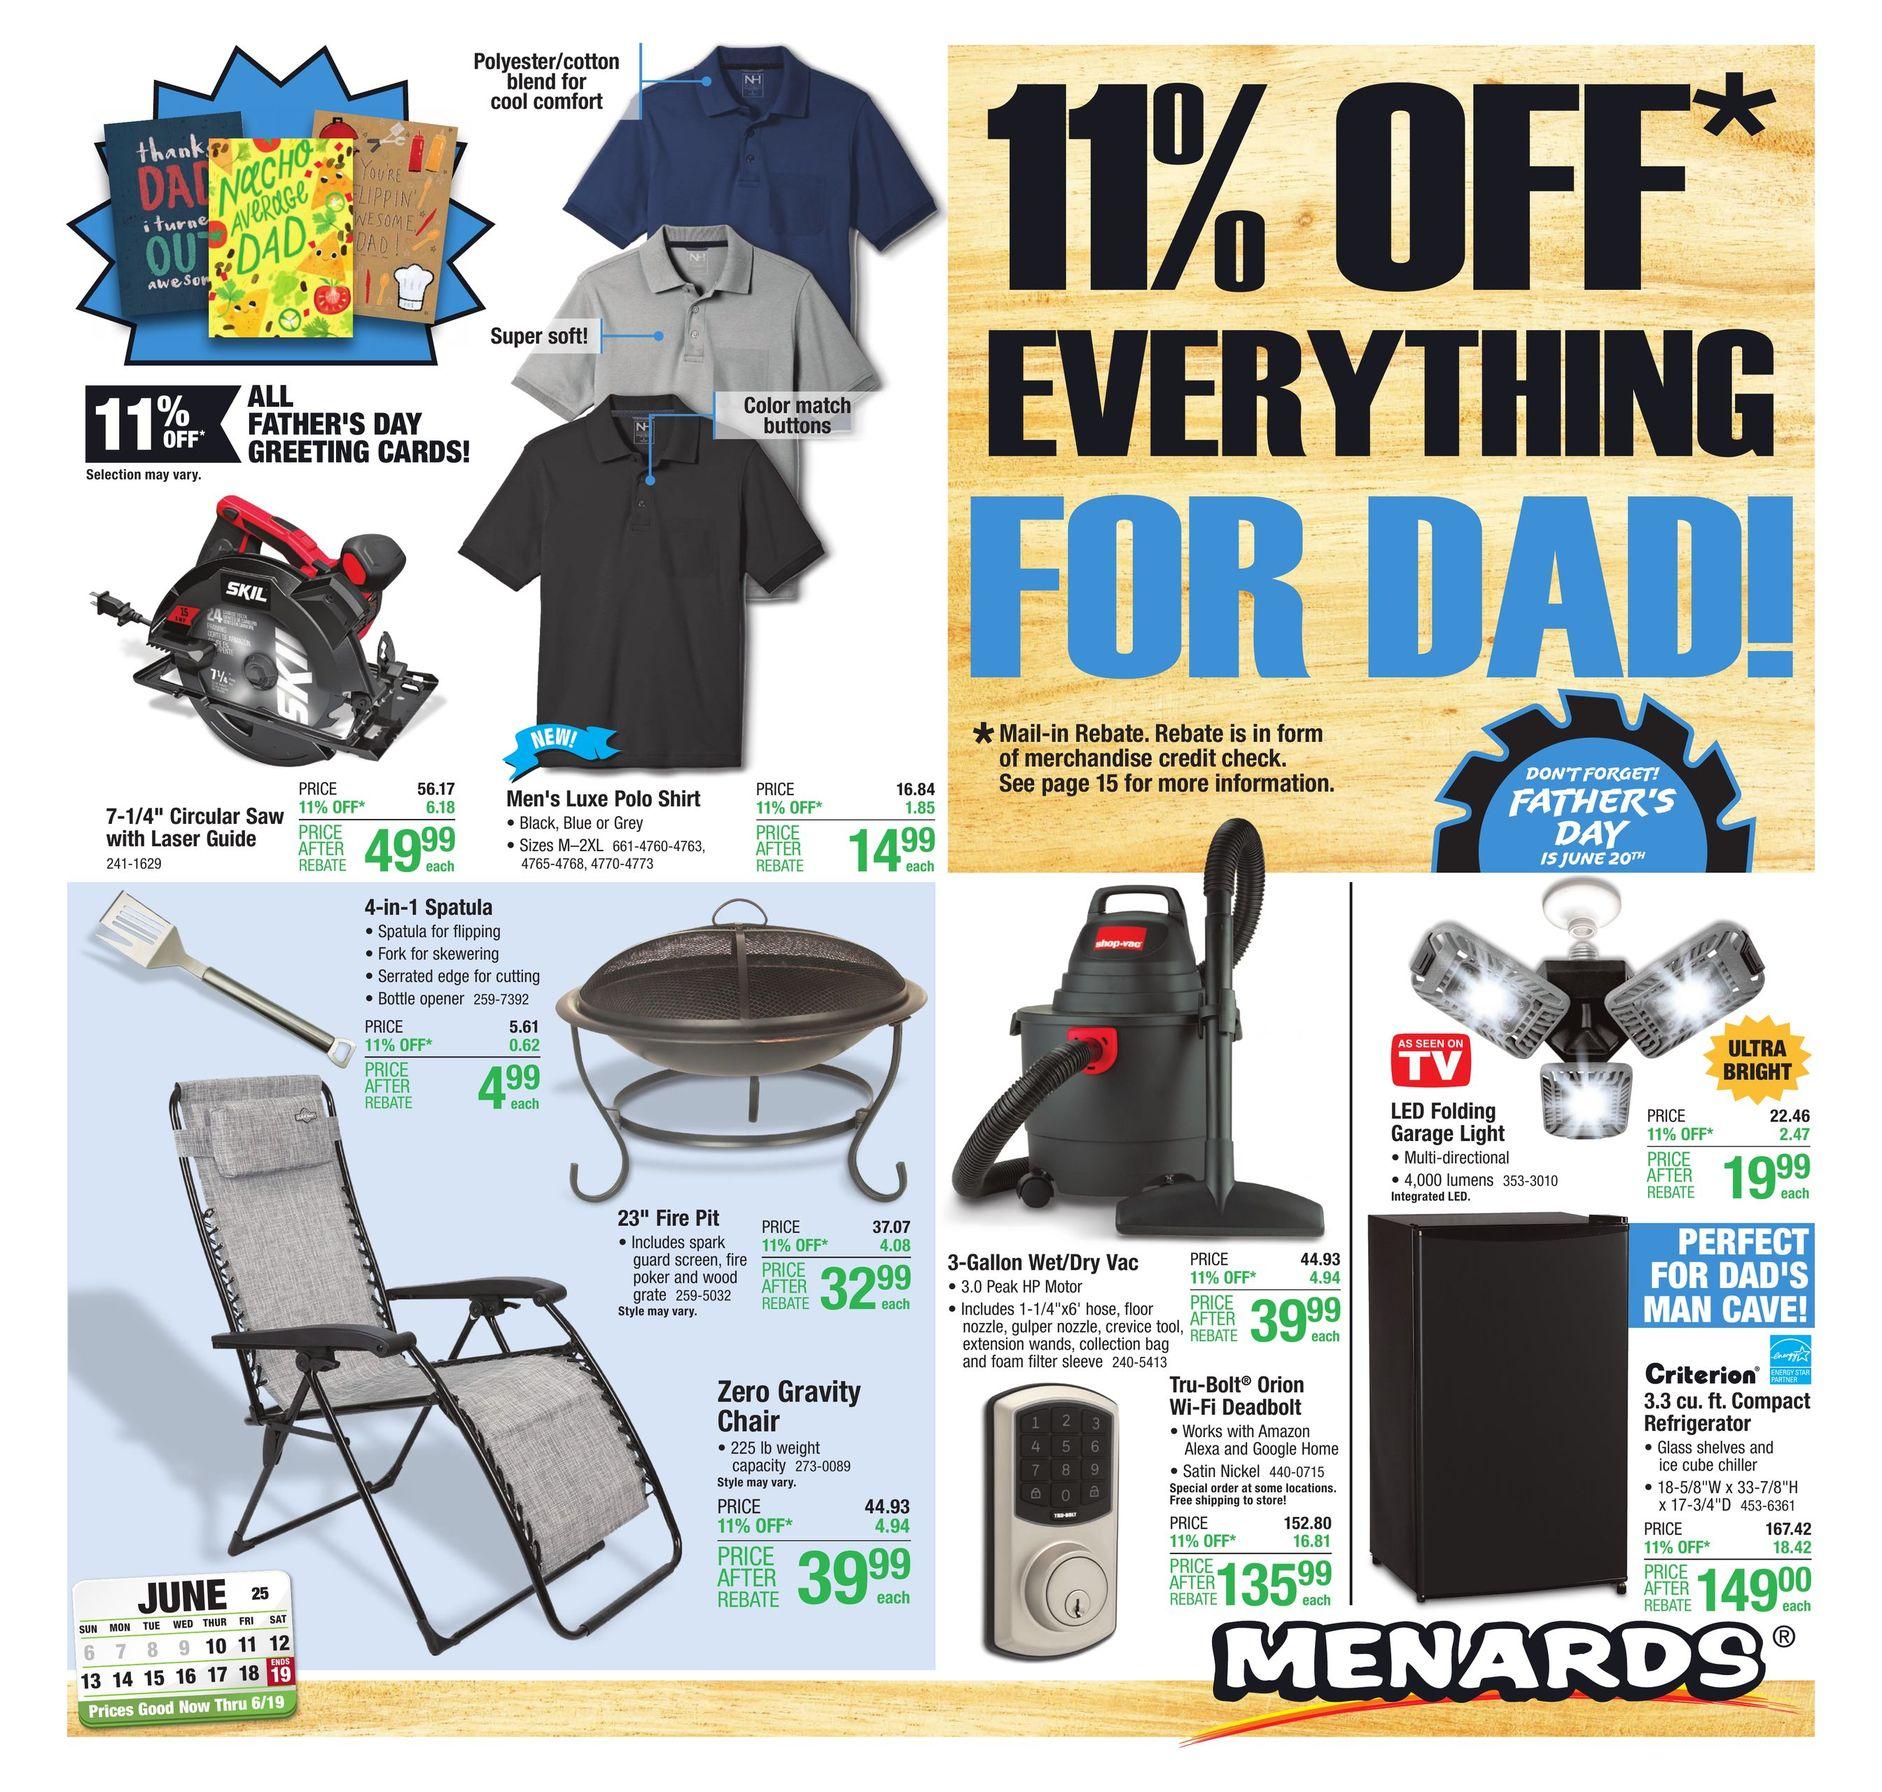 Menards Weekly Ad June 10 - June 19, 2021